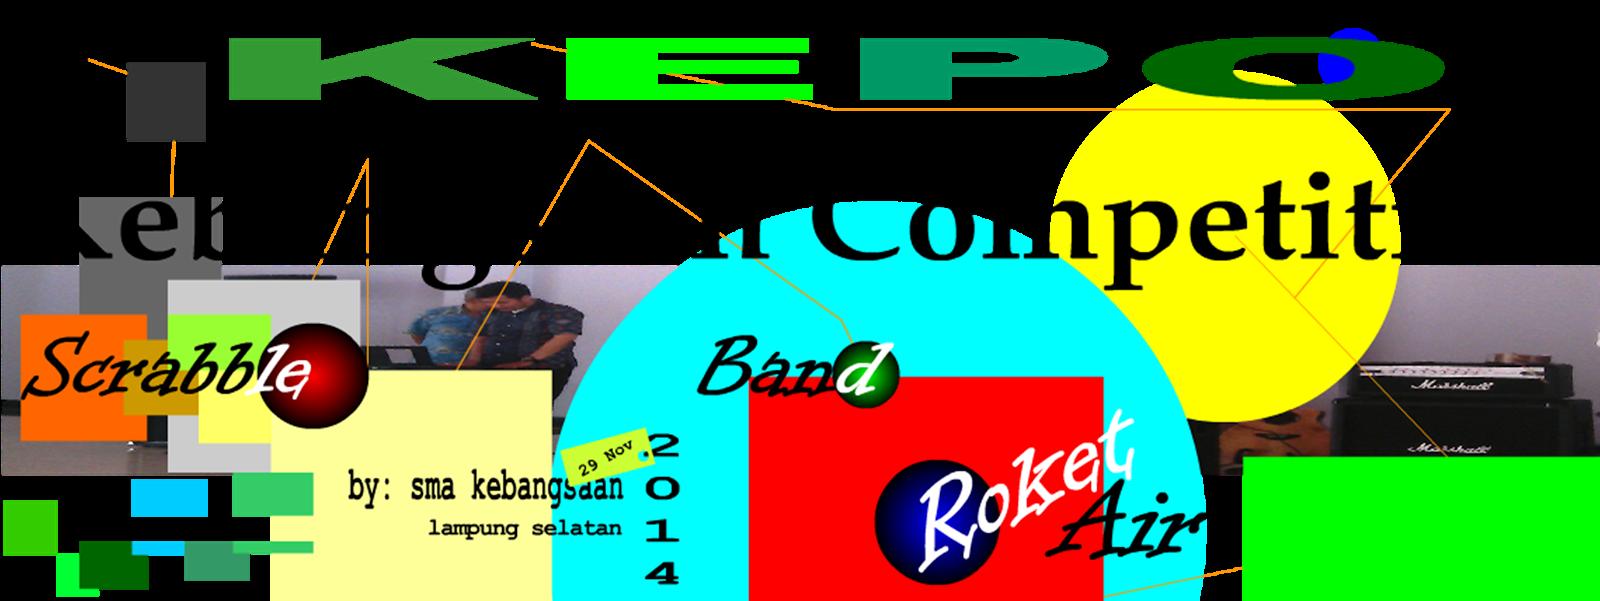 Baner Kebangsaan Competition (KePo)